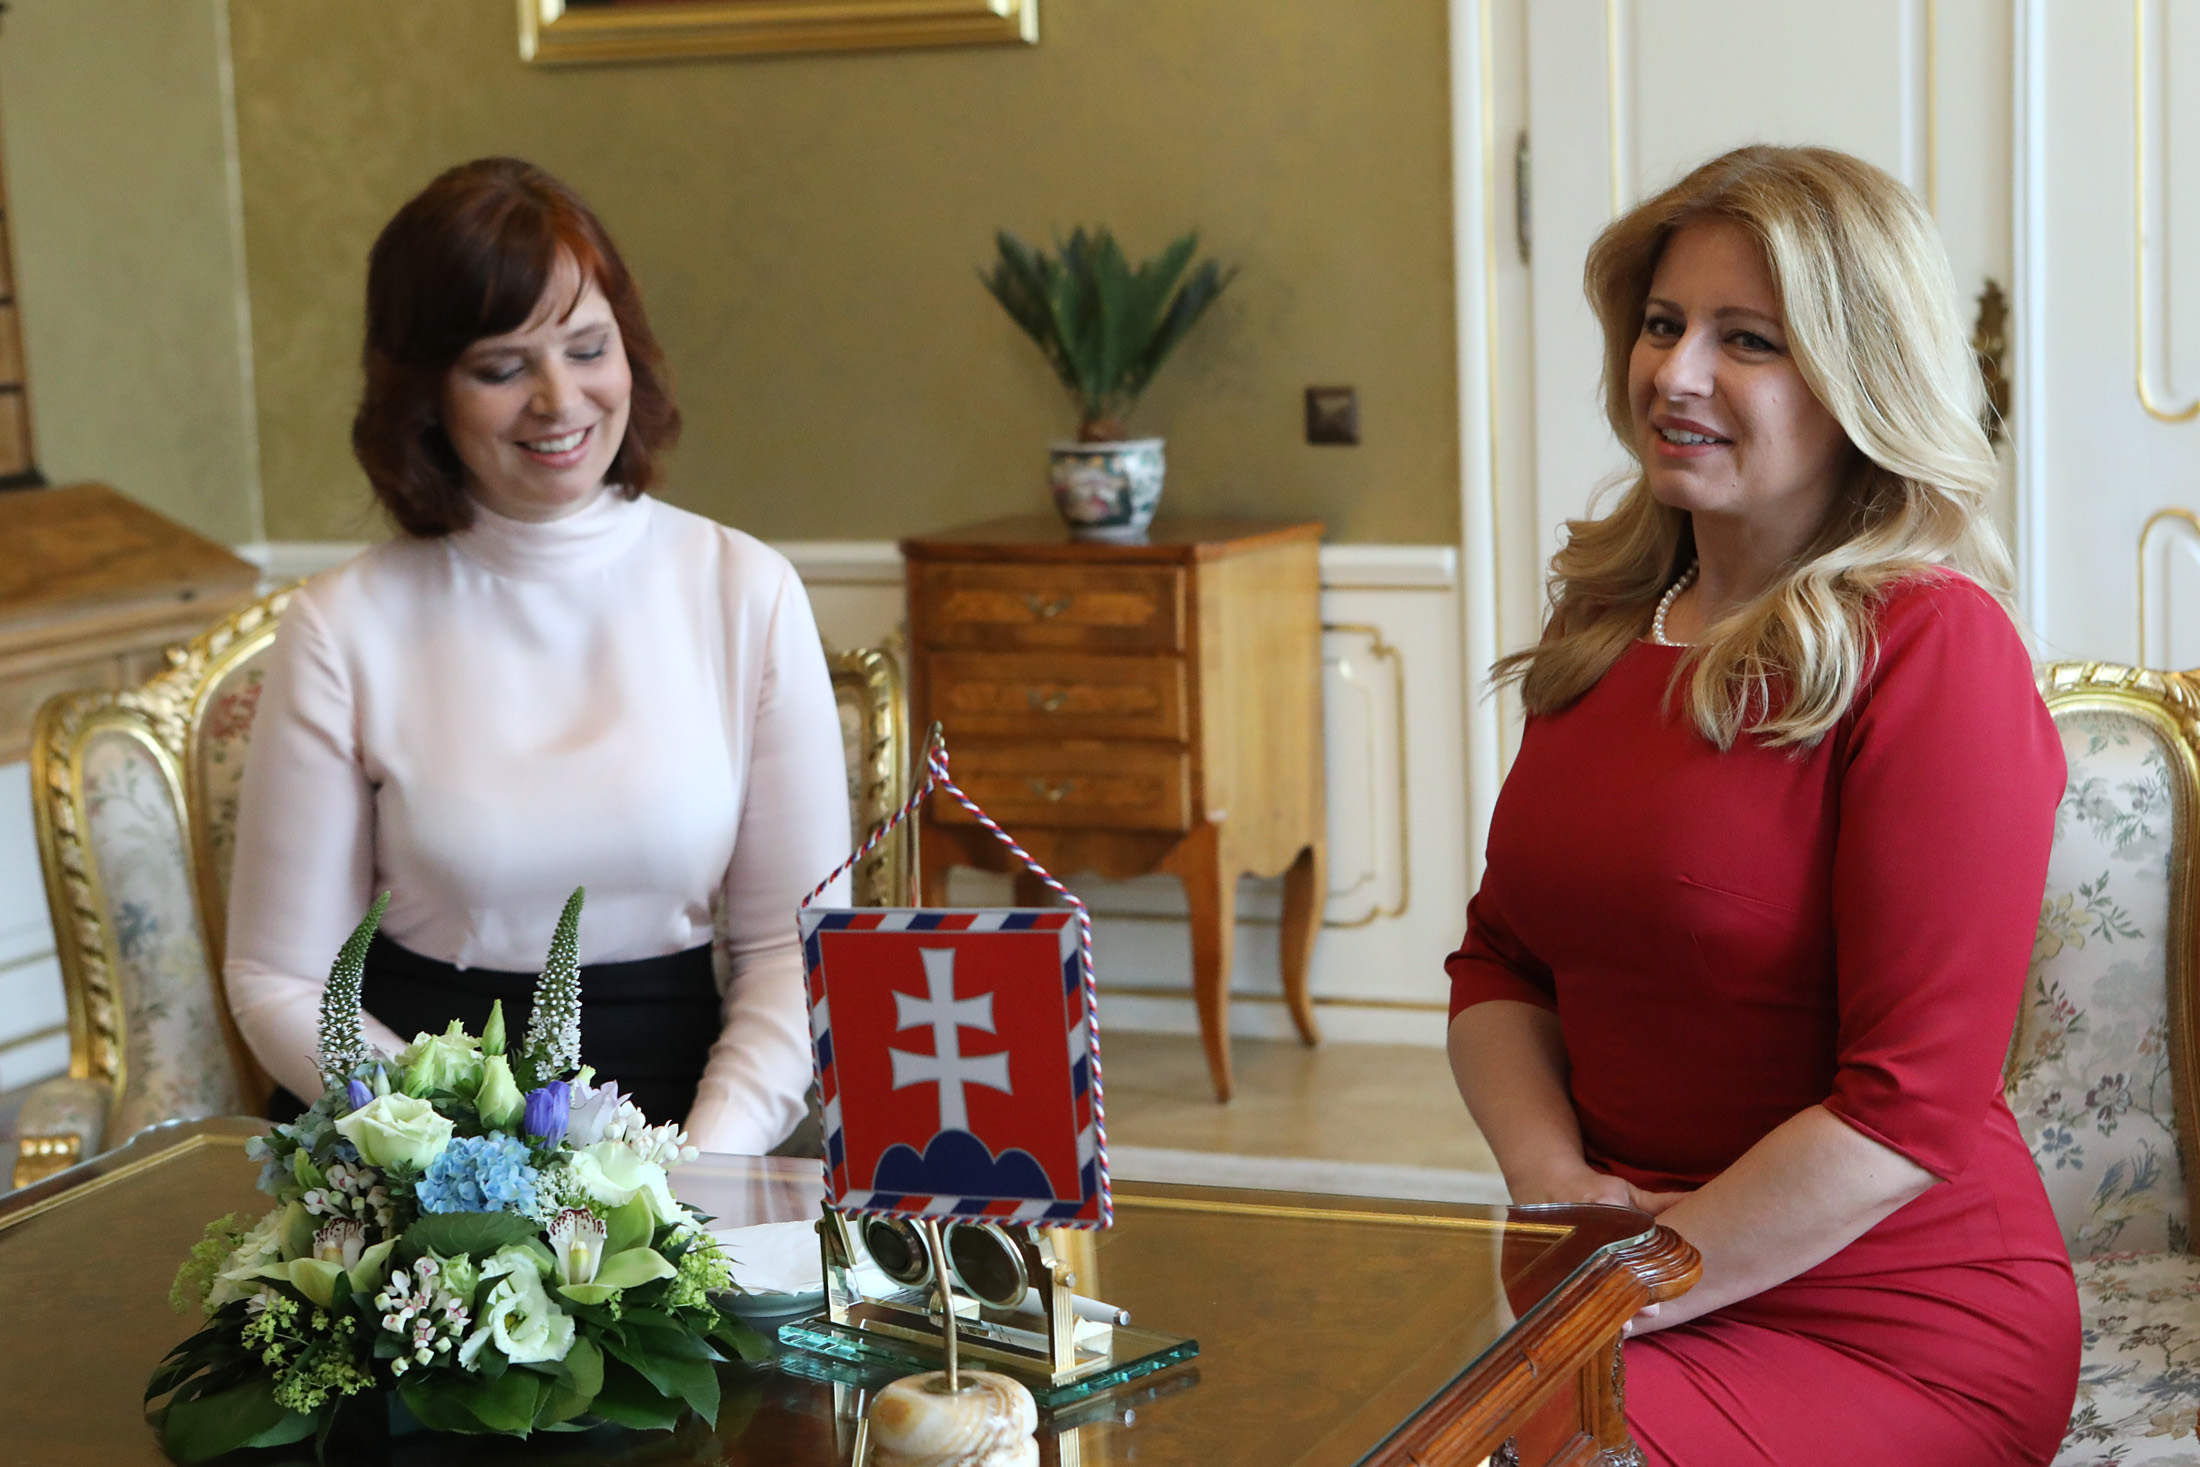 Prezidentka sa stretla s podpredsedníčkou vlády Veronikou Remišovou